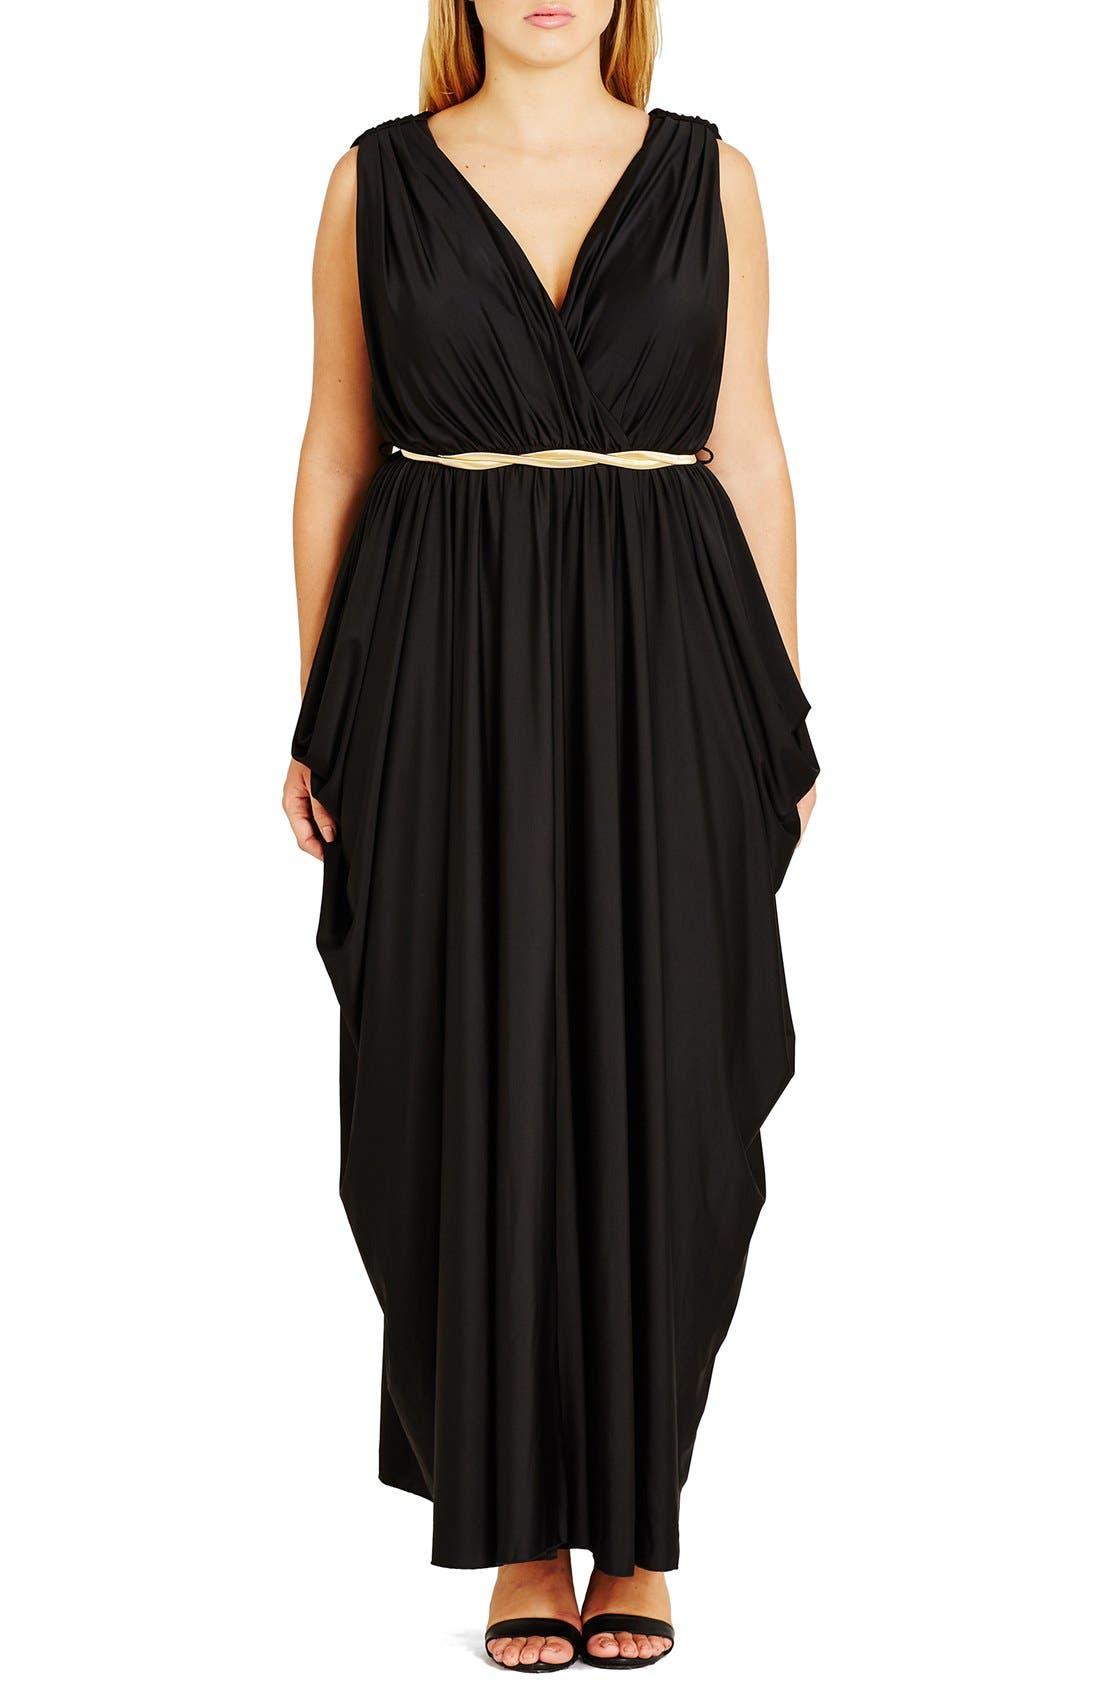 Main Image - City Chic 'Athena Goddess' Maxi Dress (Plus Size)